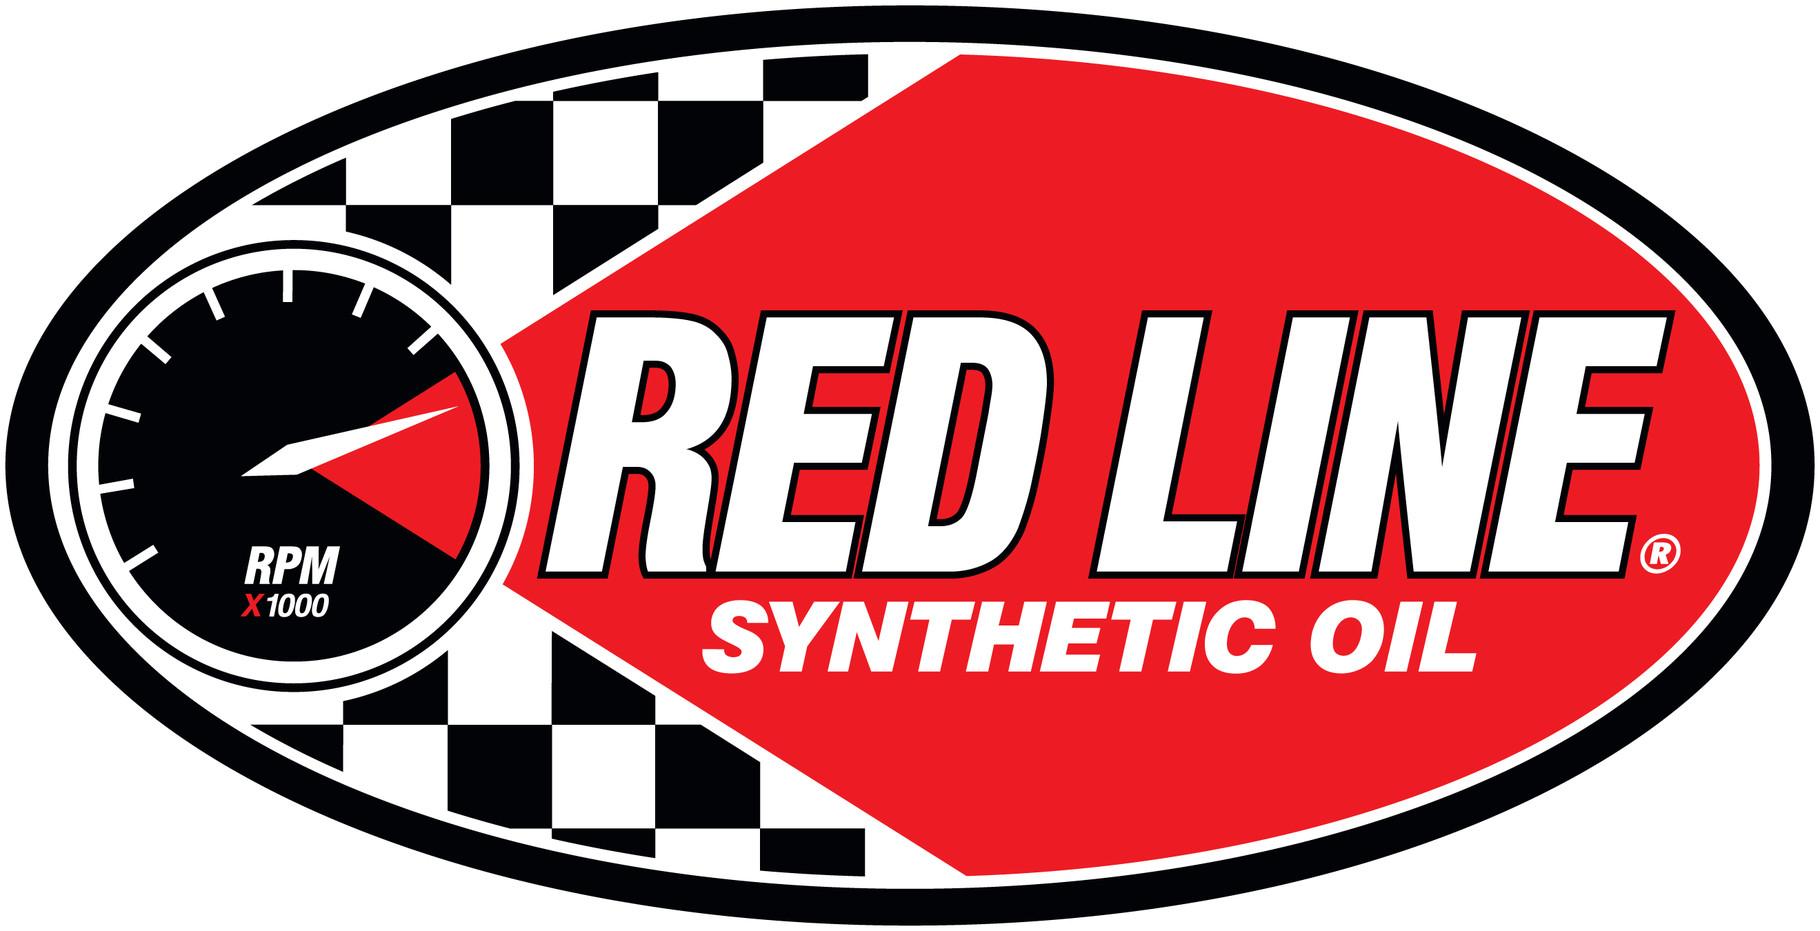 red line gear oil manual transmission oil performance car parts nz best prices quality. Black Bedroom Furniture Sets. Home Design Ideas